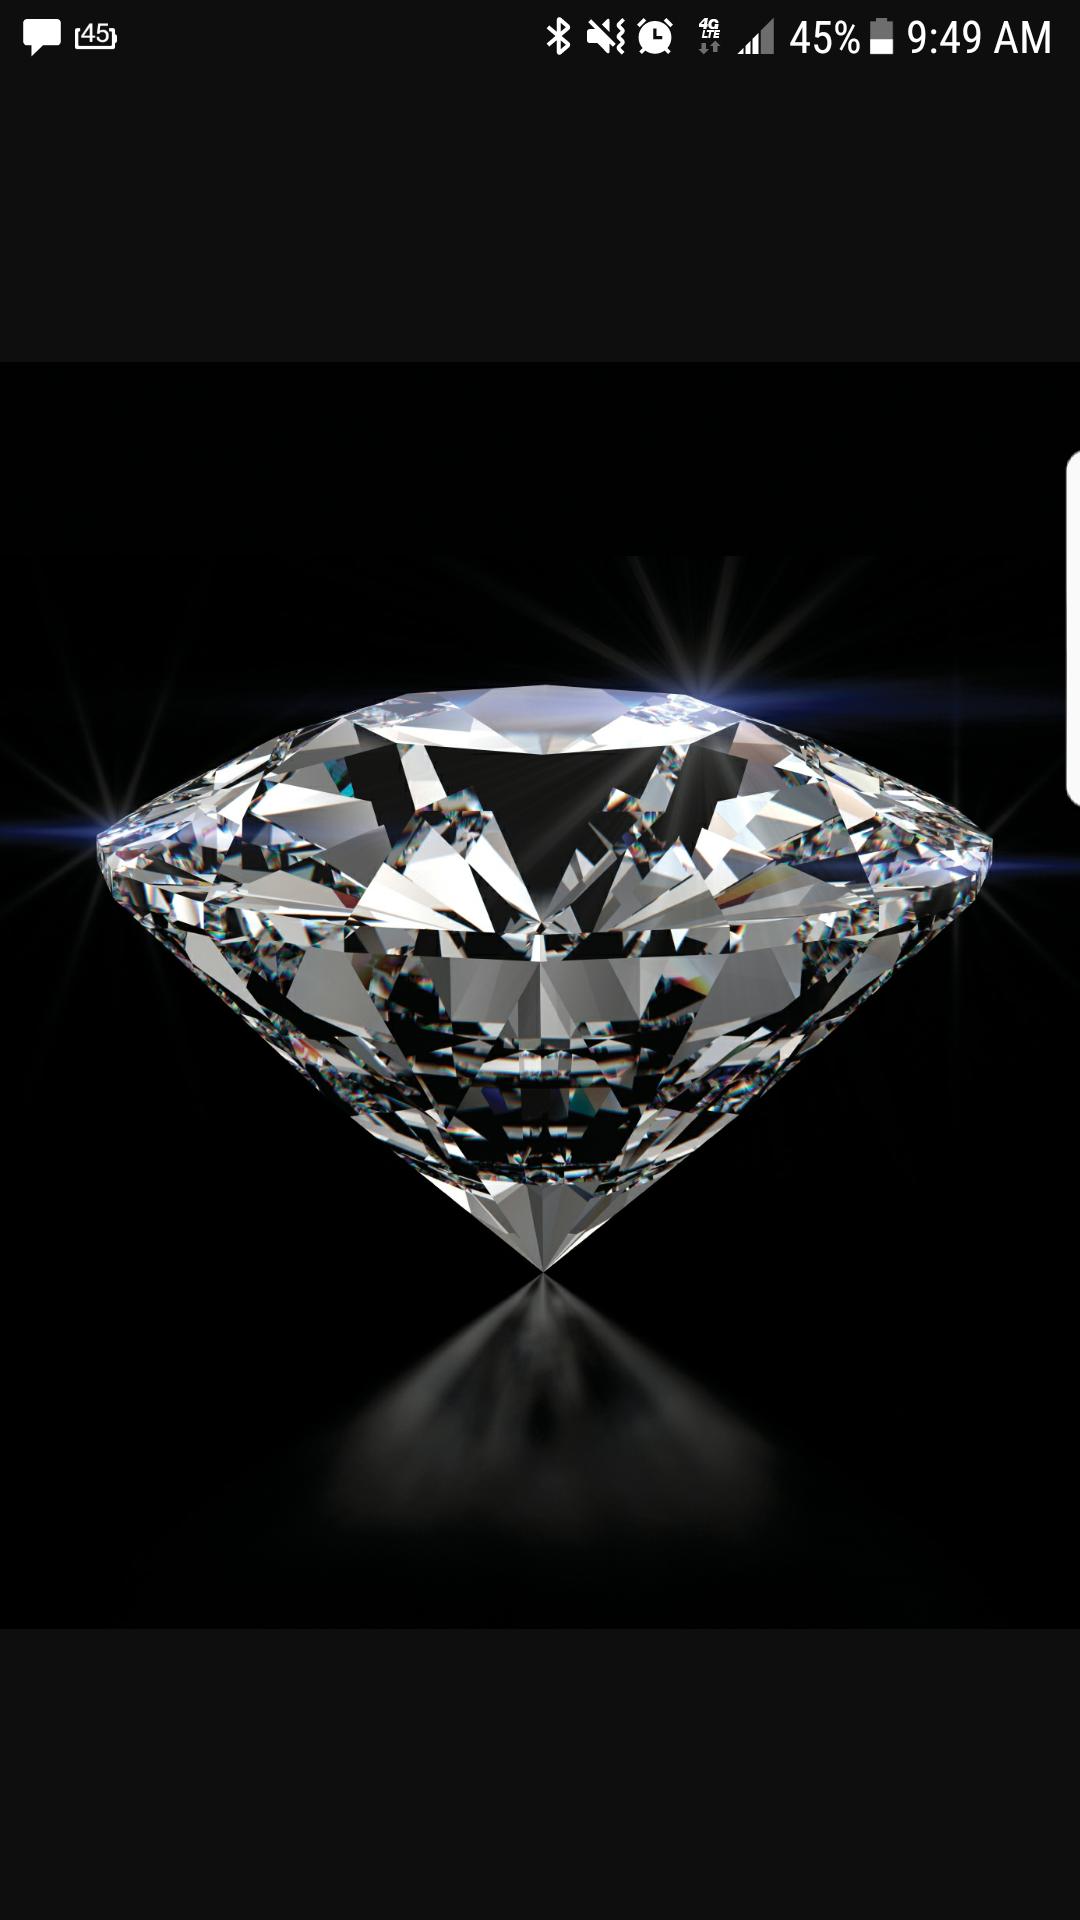 Diamondcoach4u